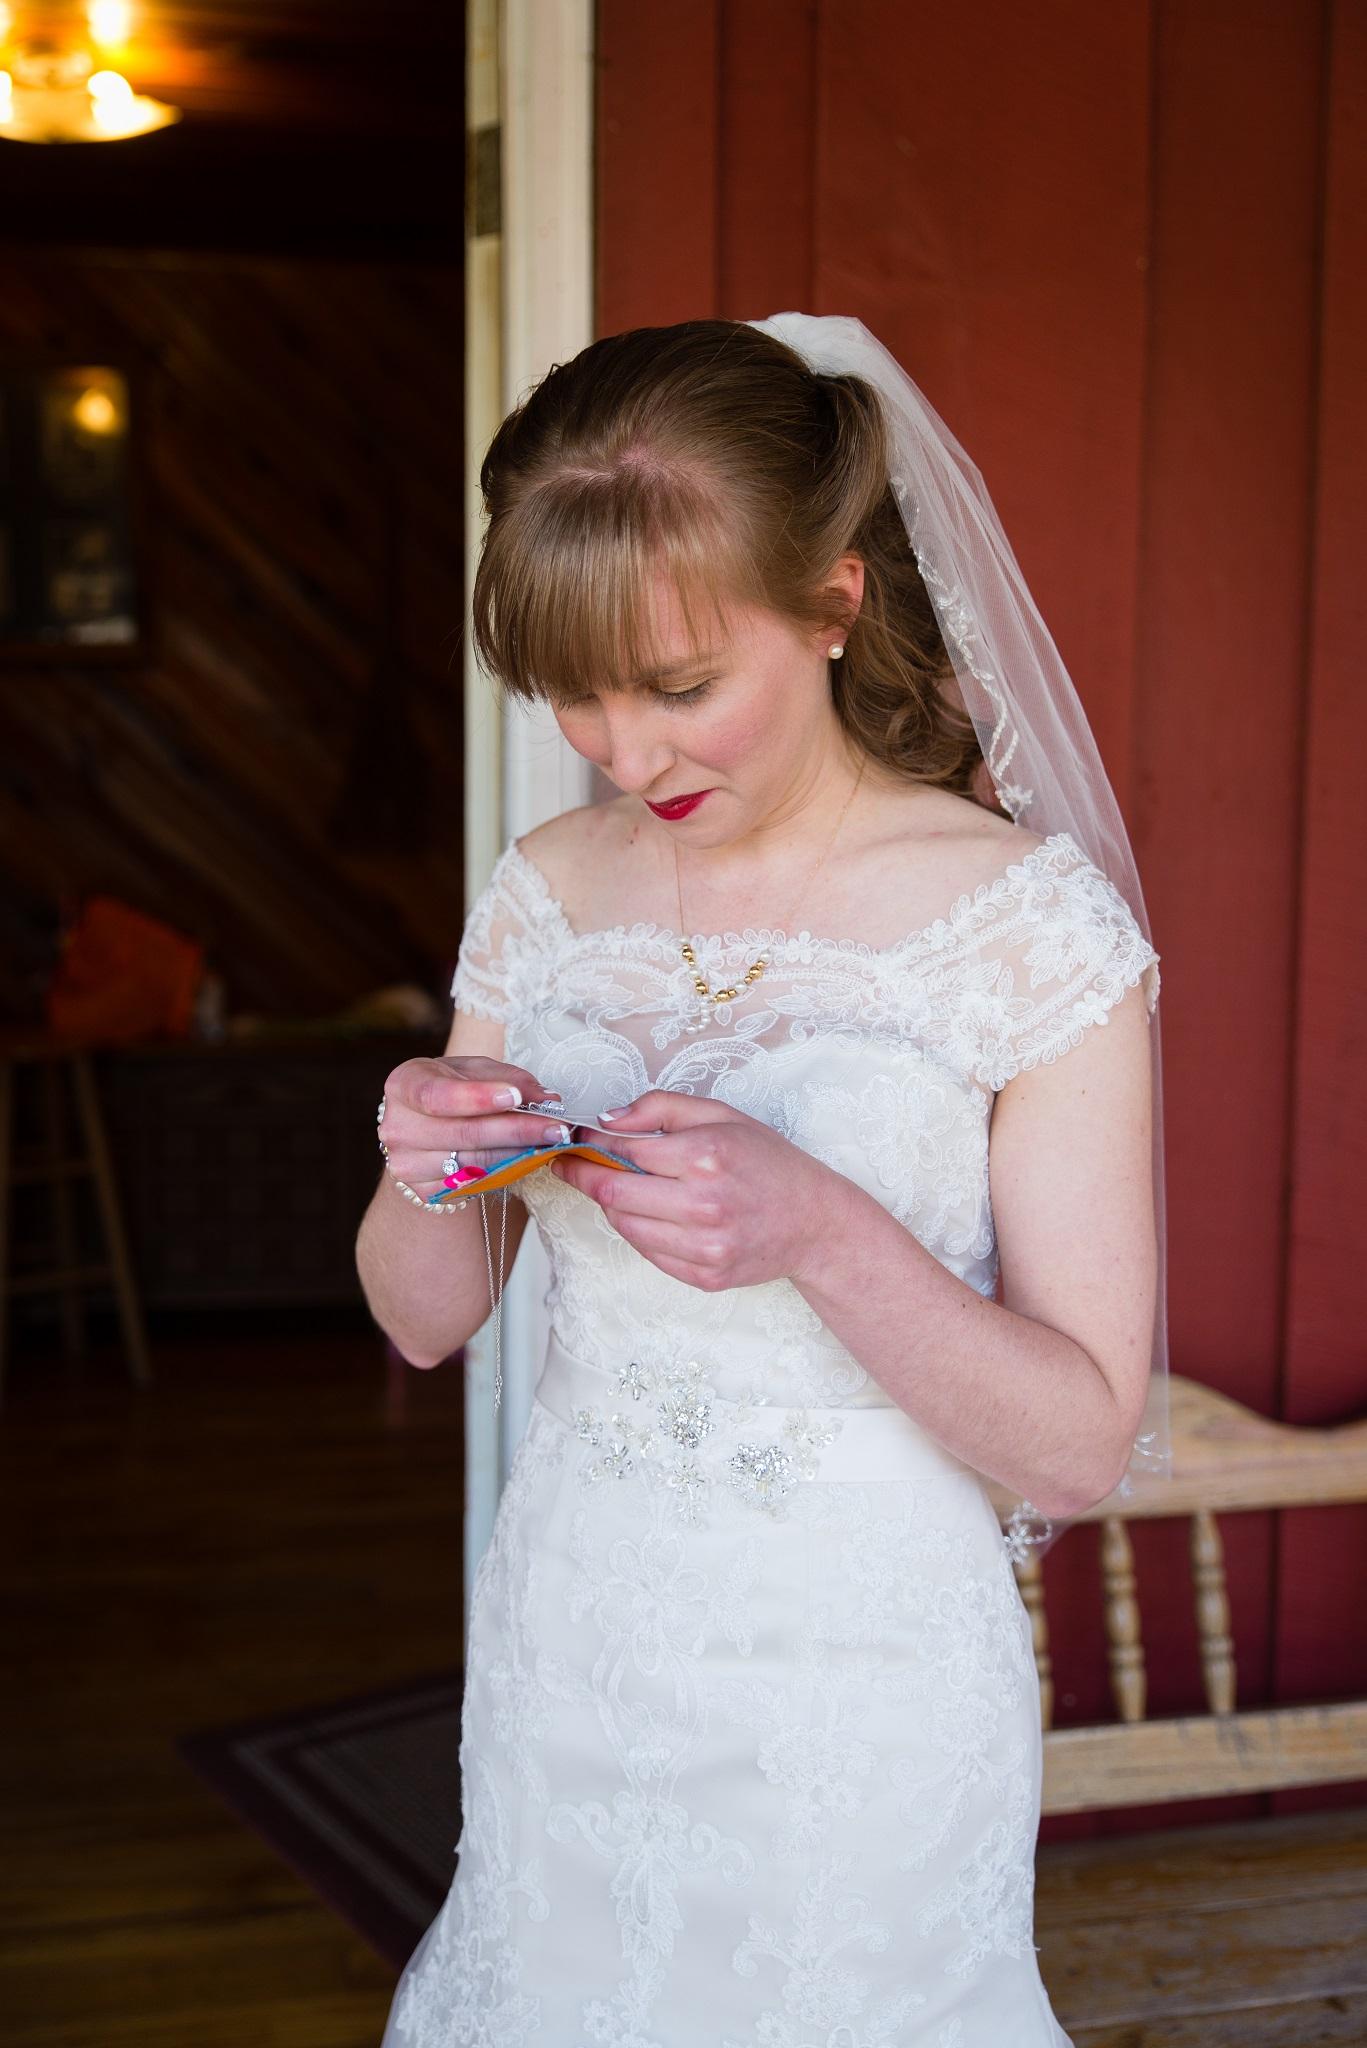 kentucky wedding, Cliffview Resort, rrg, Red River Gorge, kentucky bride